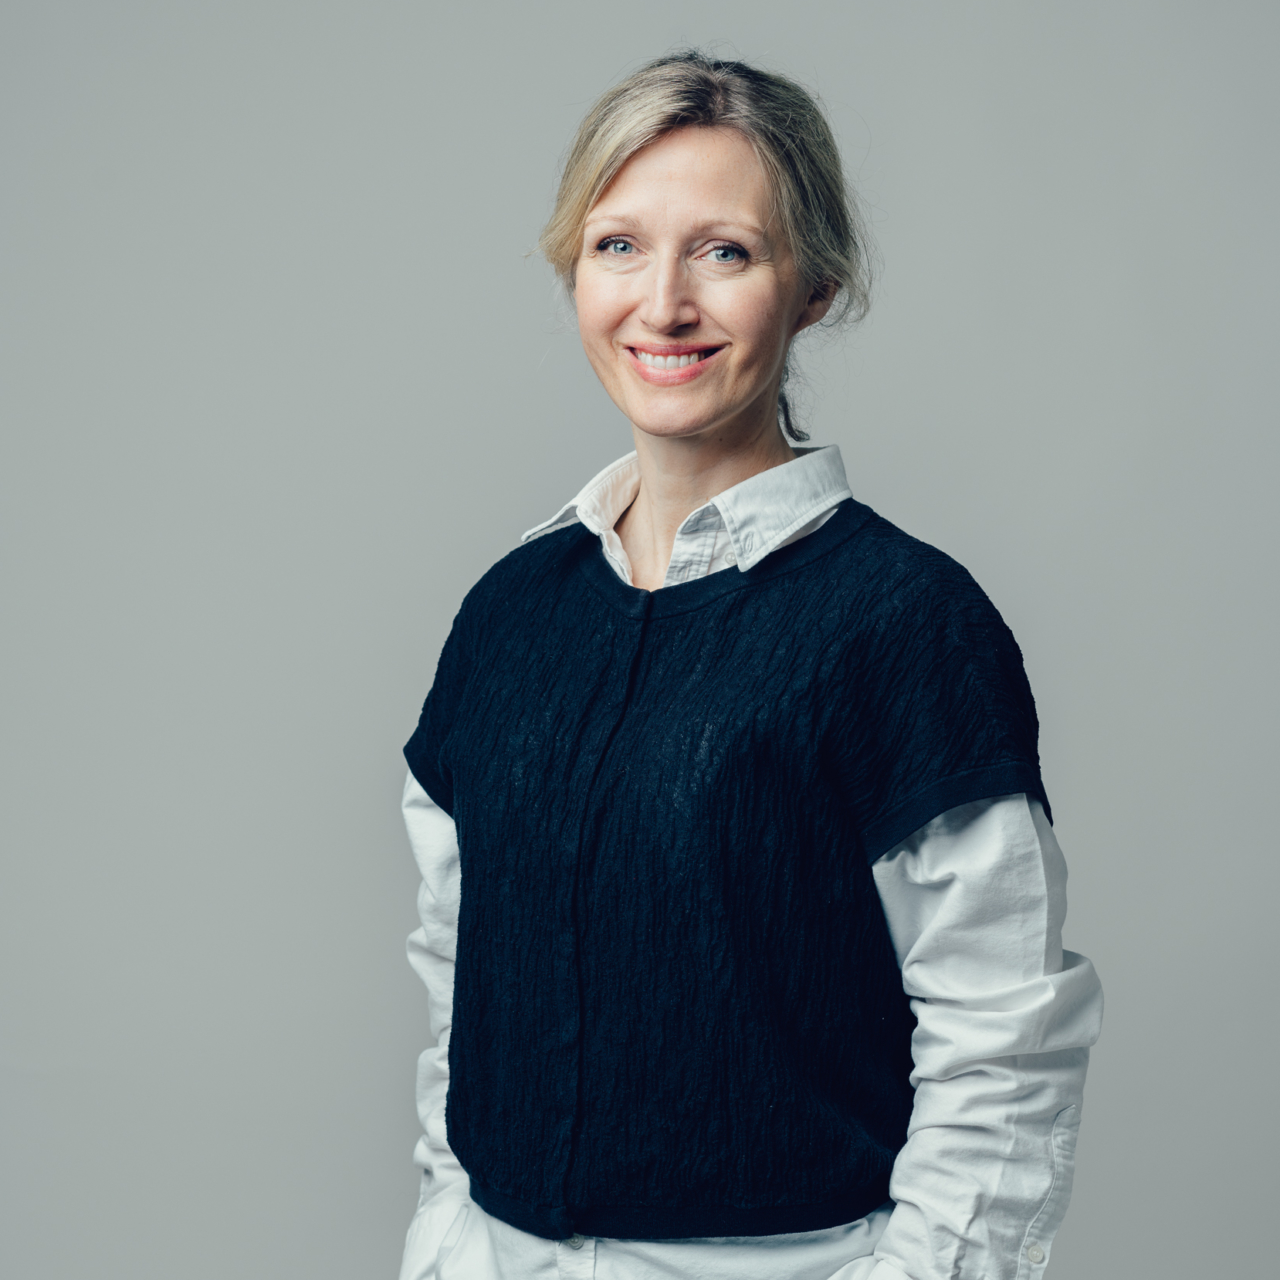 Viktoria Flygare